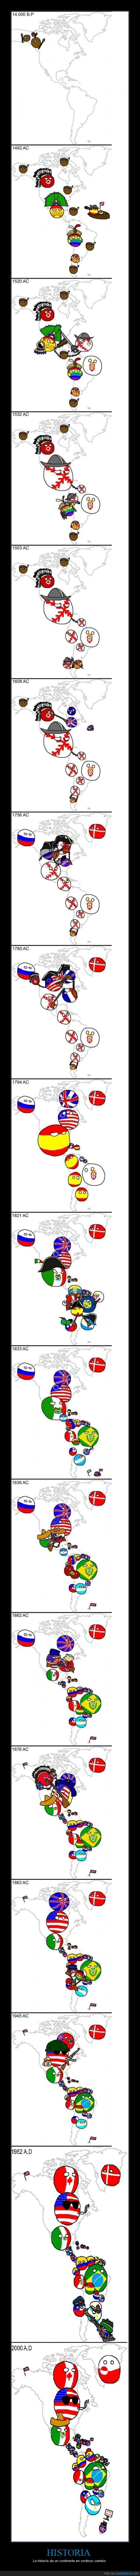 america,cambio,guerra. banderas,lucha,paises